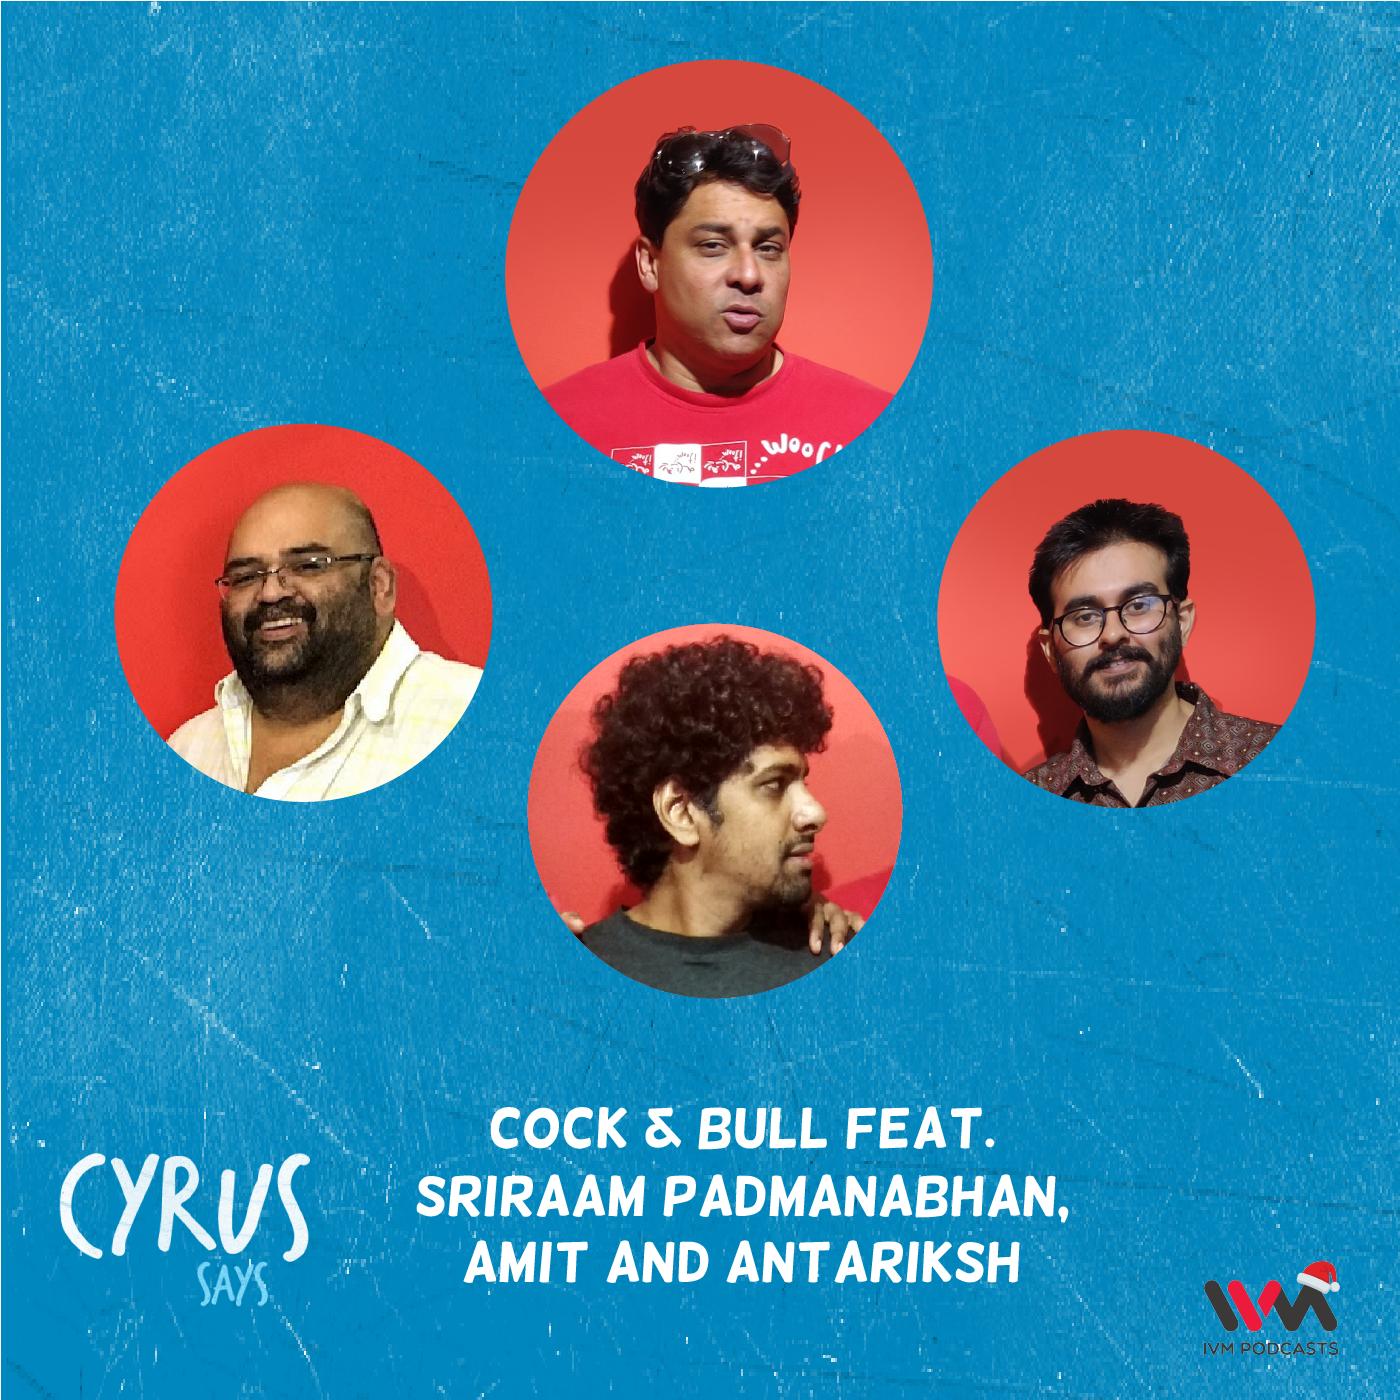 Ep. 597: Cock & Bull feat. Sriraam Padmanabhan, Amit and Antariksh